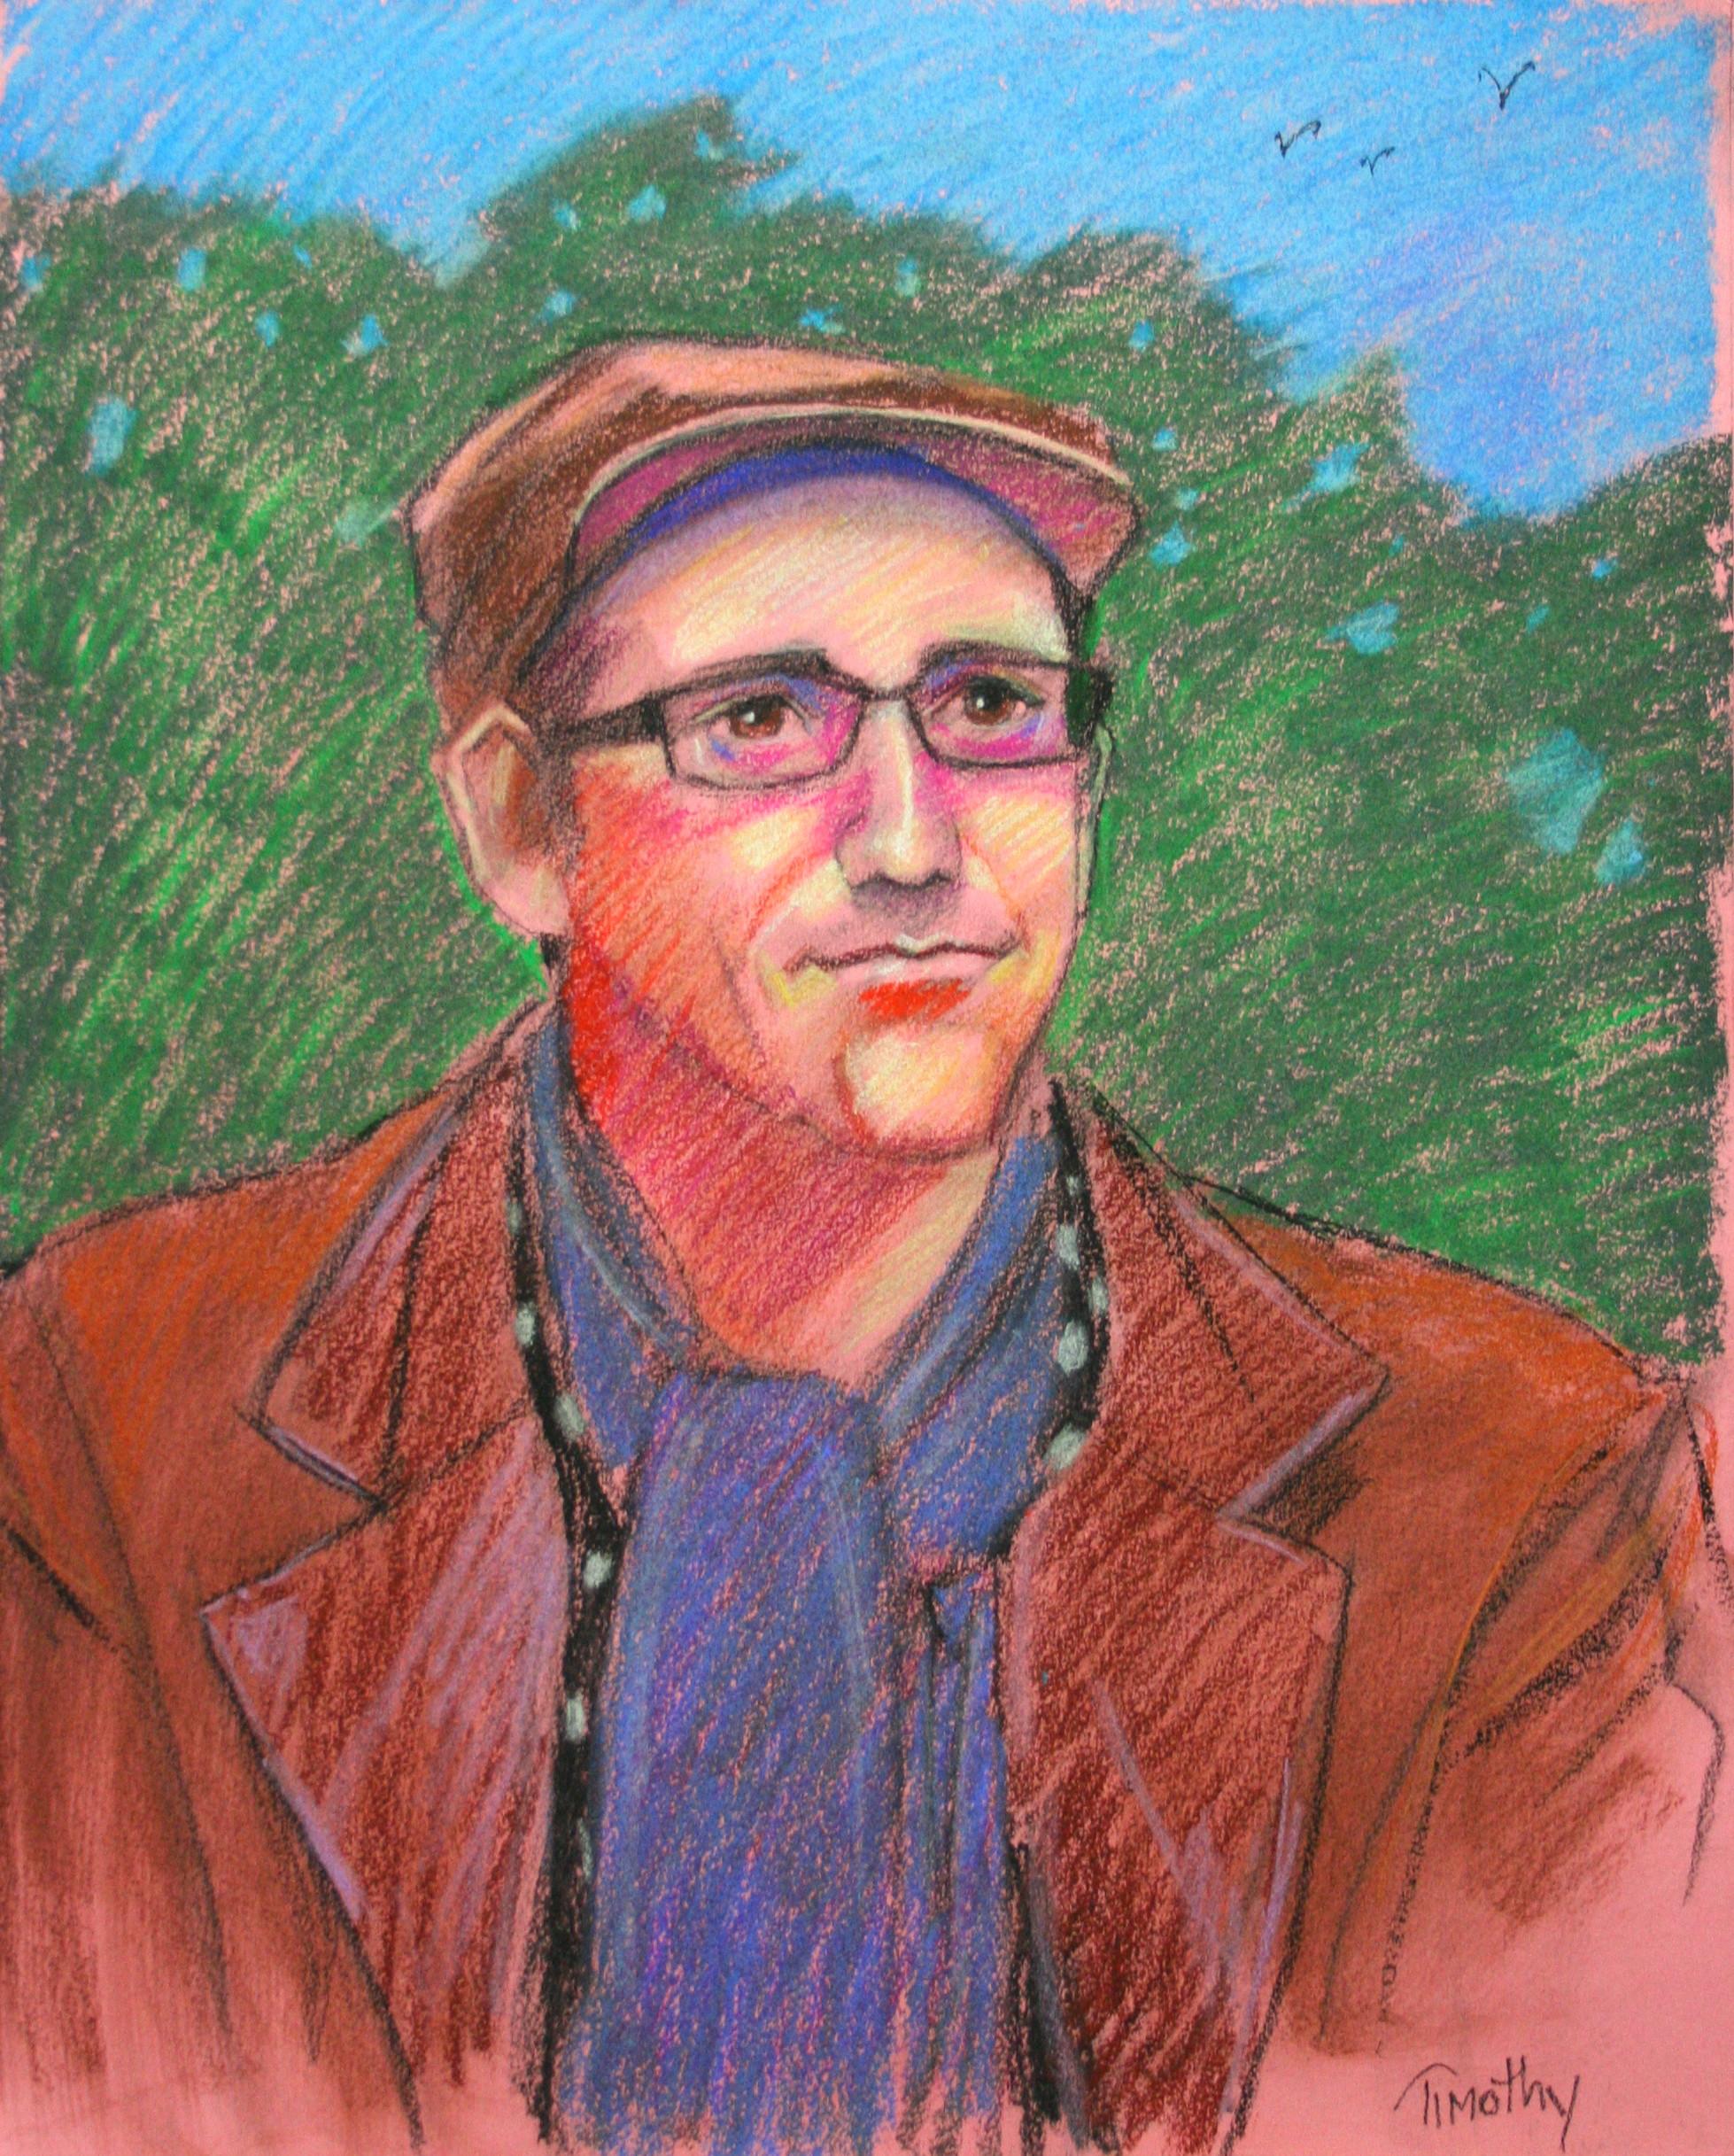 Tim Herron did this 3-hour pastel drawing.